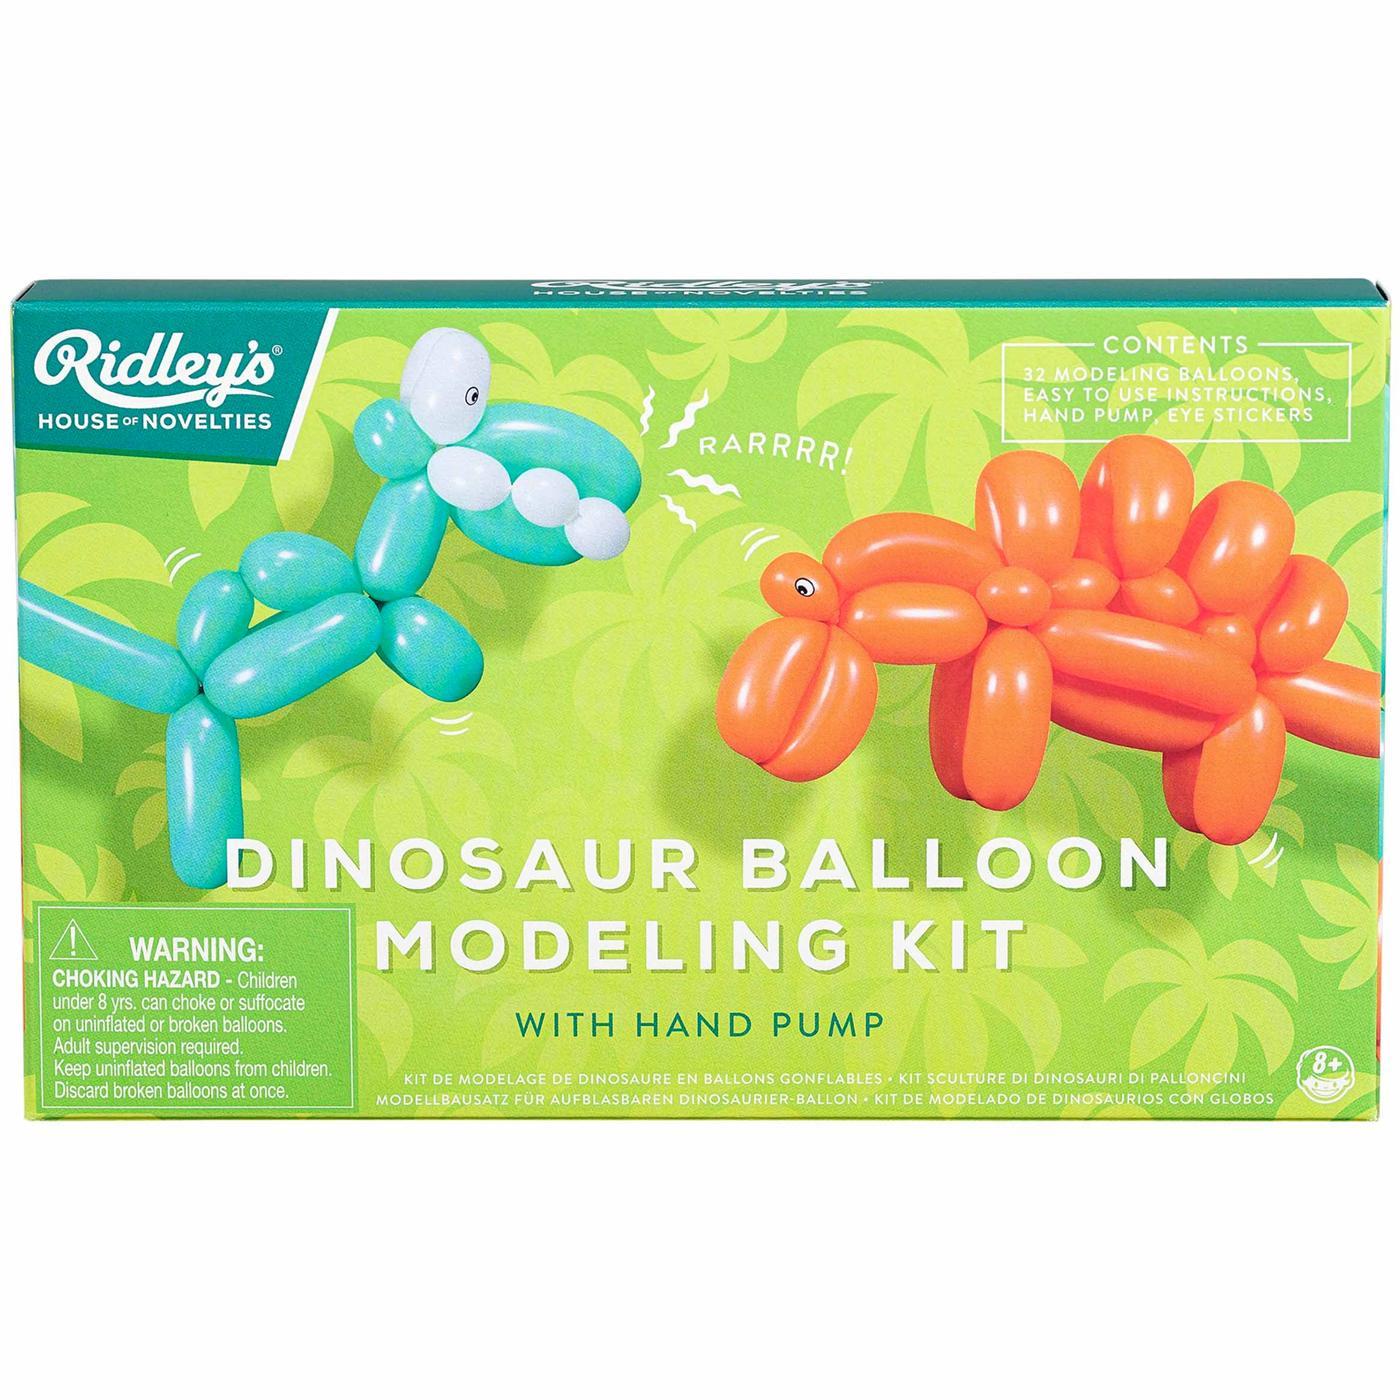 RIDLEY'S Retro Dinosaur Balloon Modelling Kit